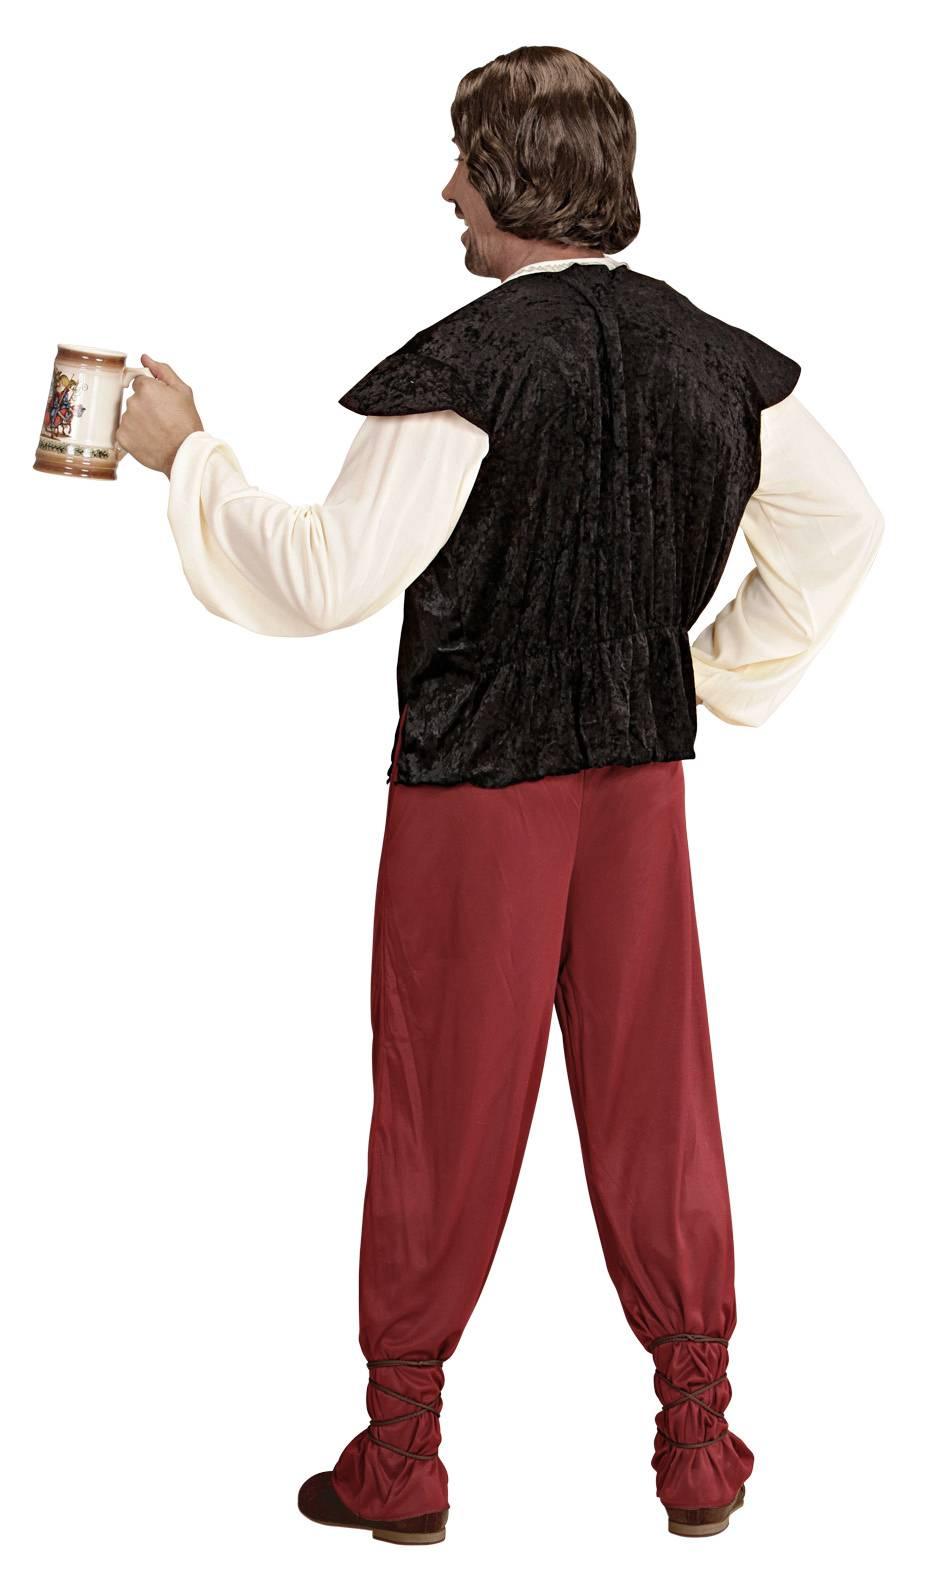 Costume-Mediéval-Homme-2